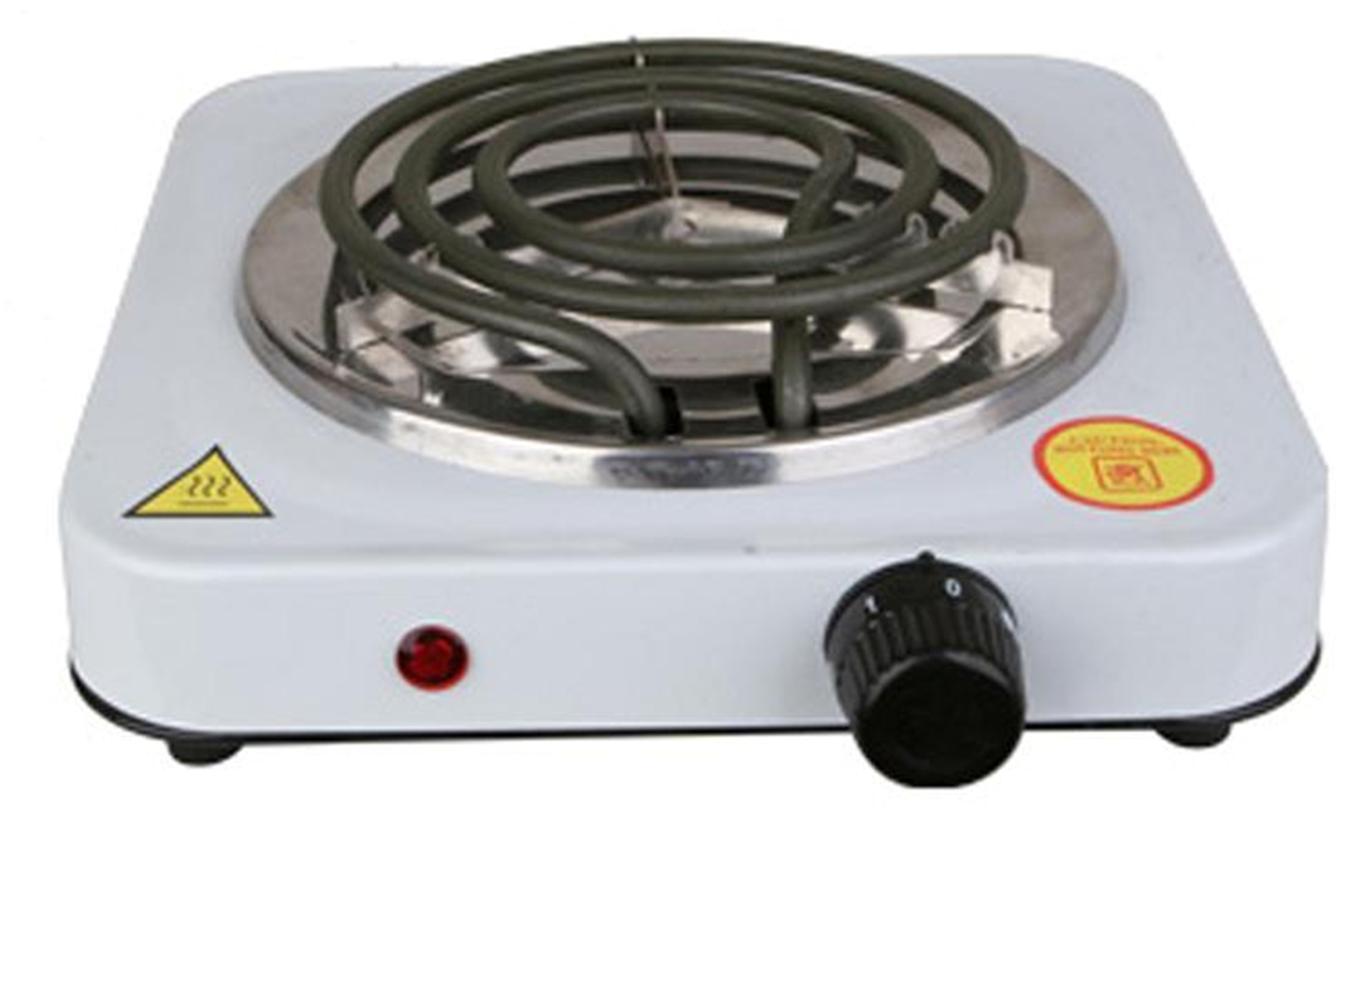 Single burner hot plate